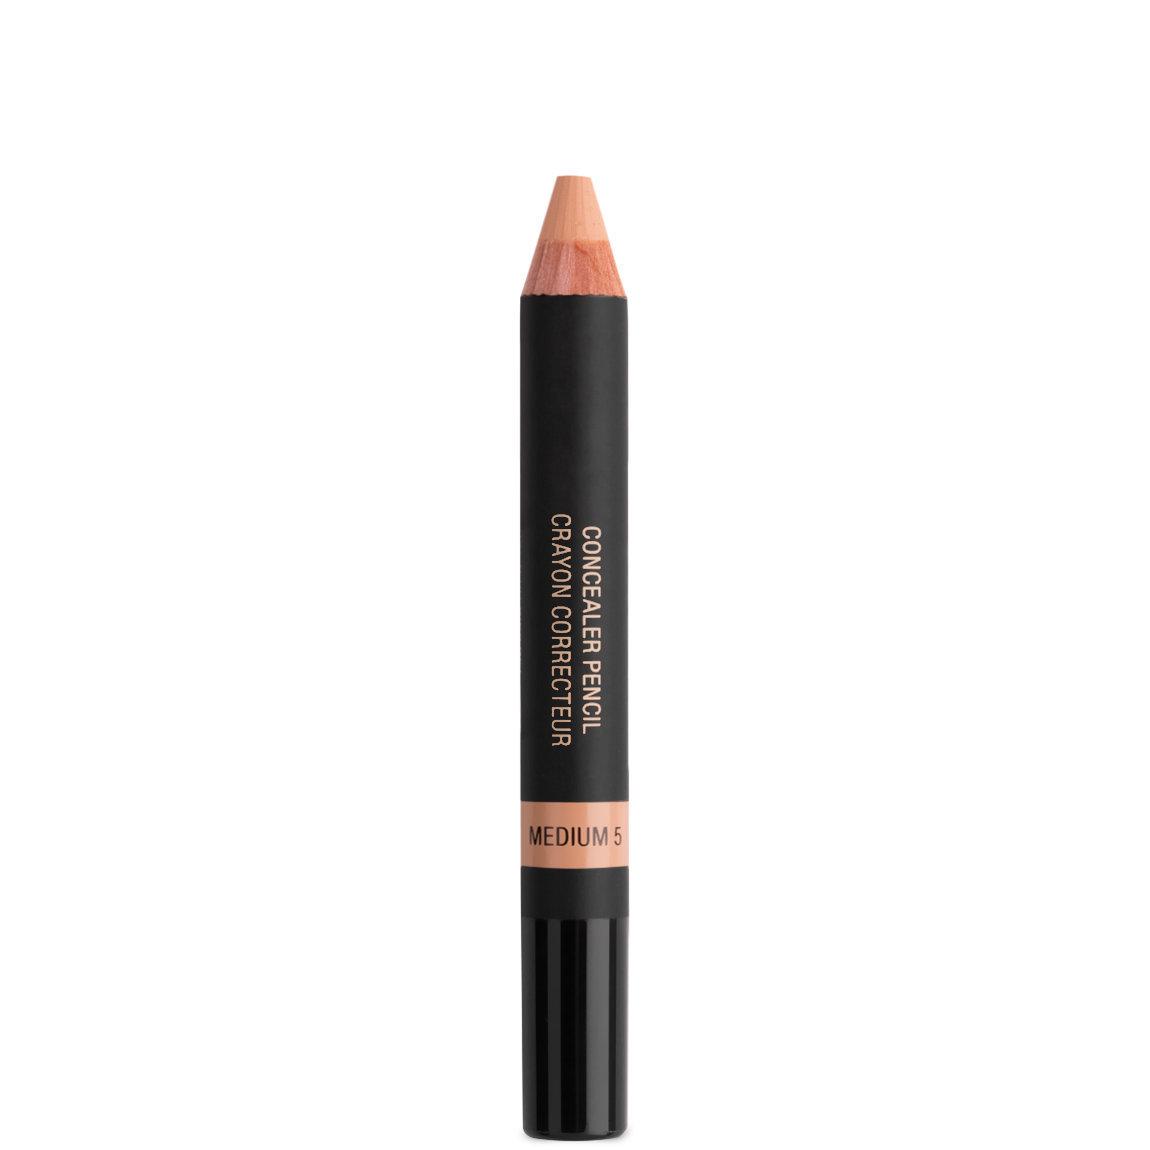 Nudestix Concealer Pencil Medium 5 alternative view 1.